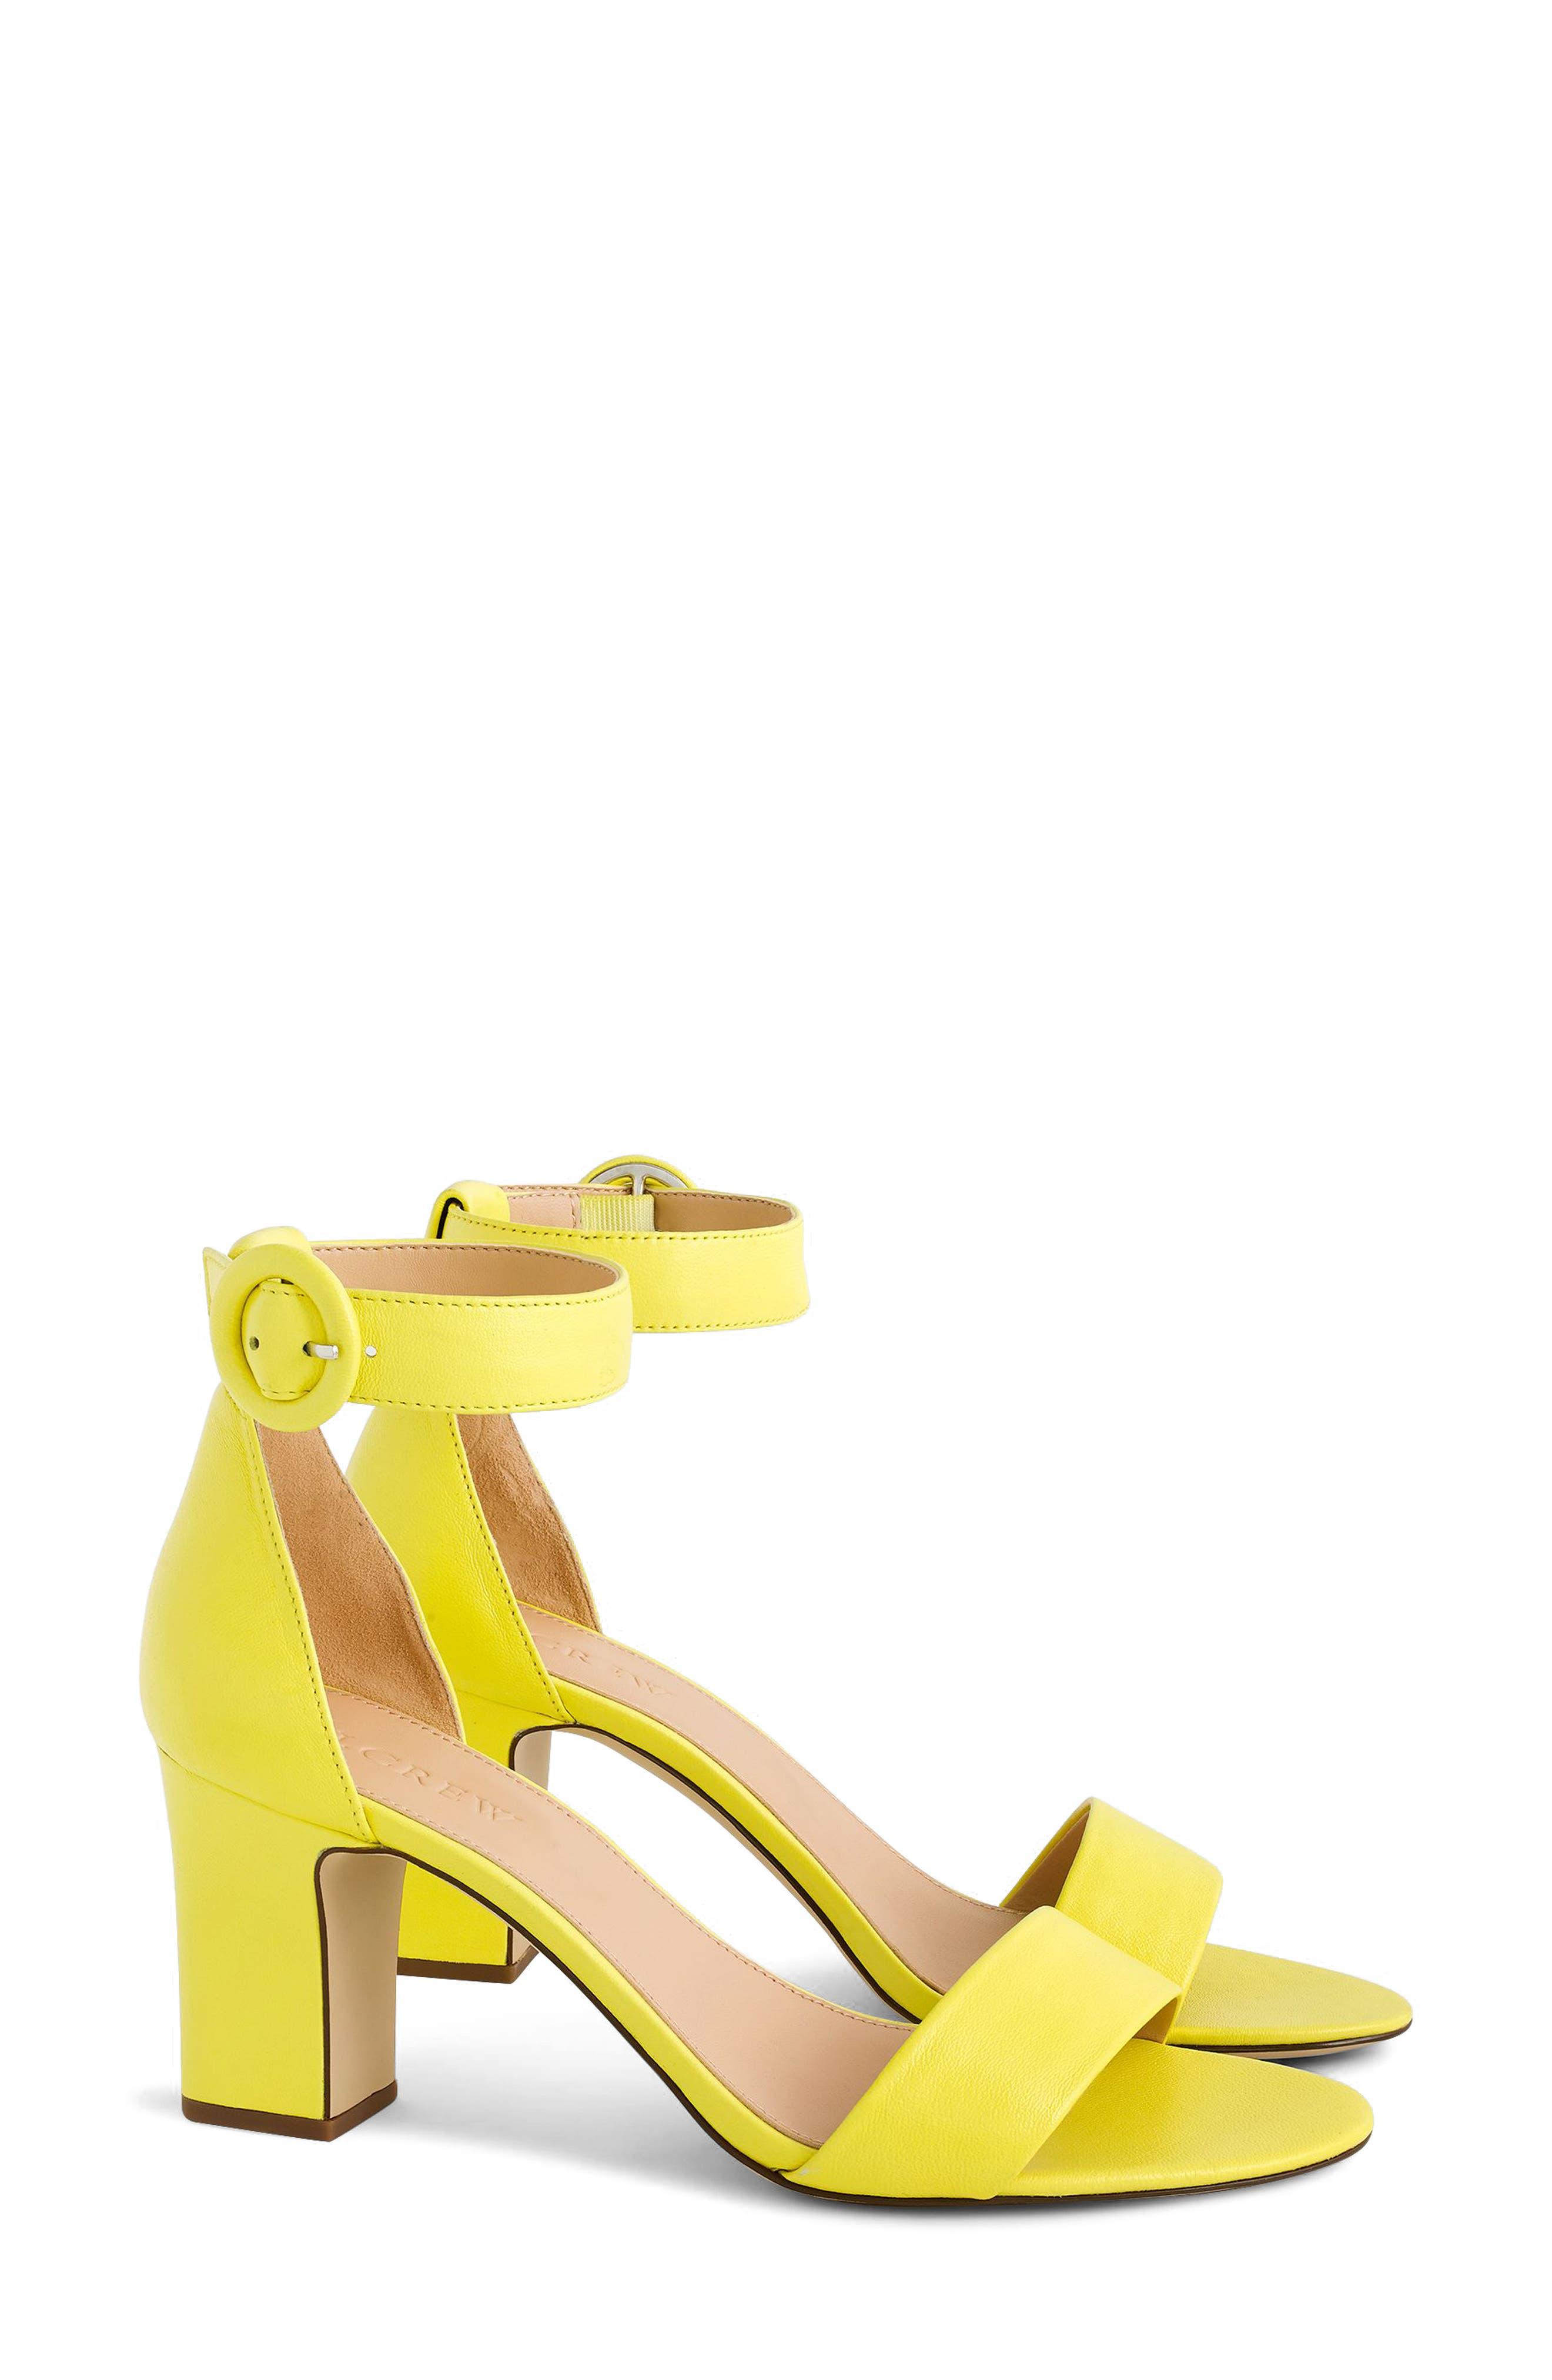 Remi Ankle Strap Sandal,                             Main thumbnail 1, color,                             Lemon Sorbet